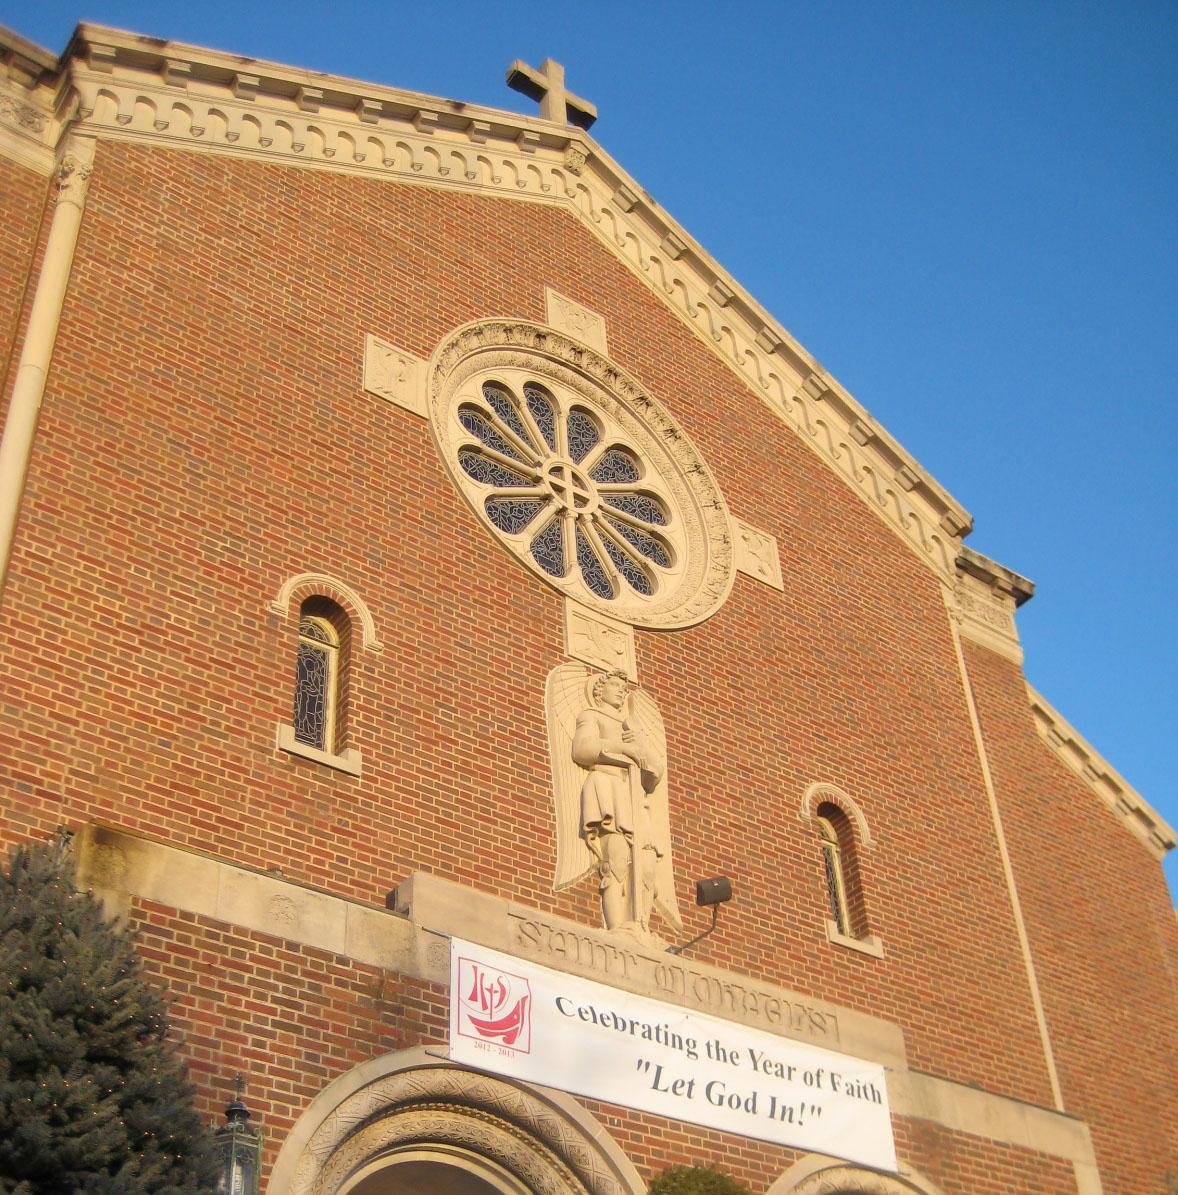 St. Michael Parish -- Celebrating the Year of Faith